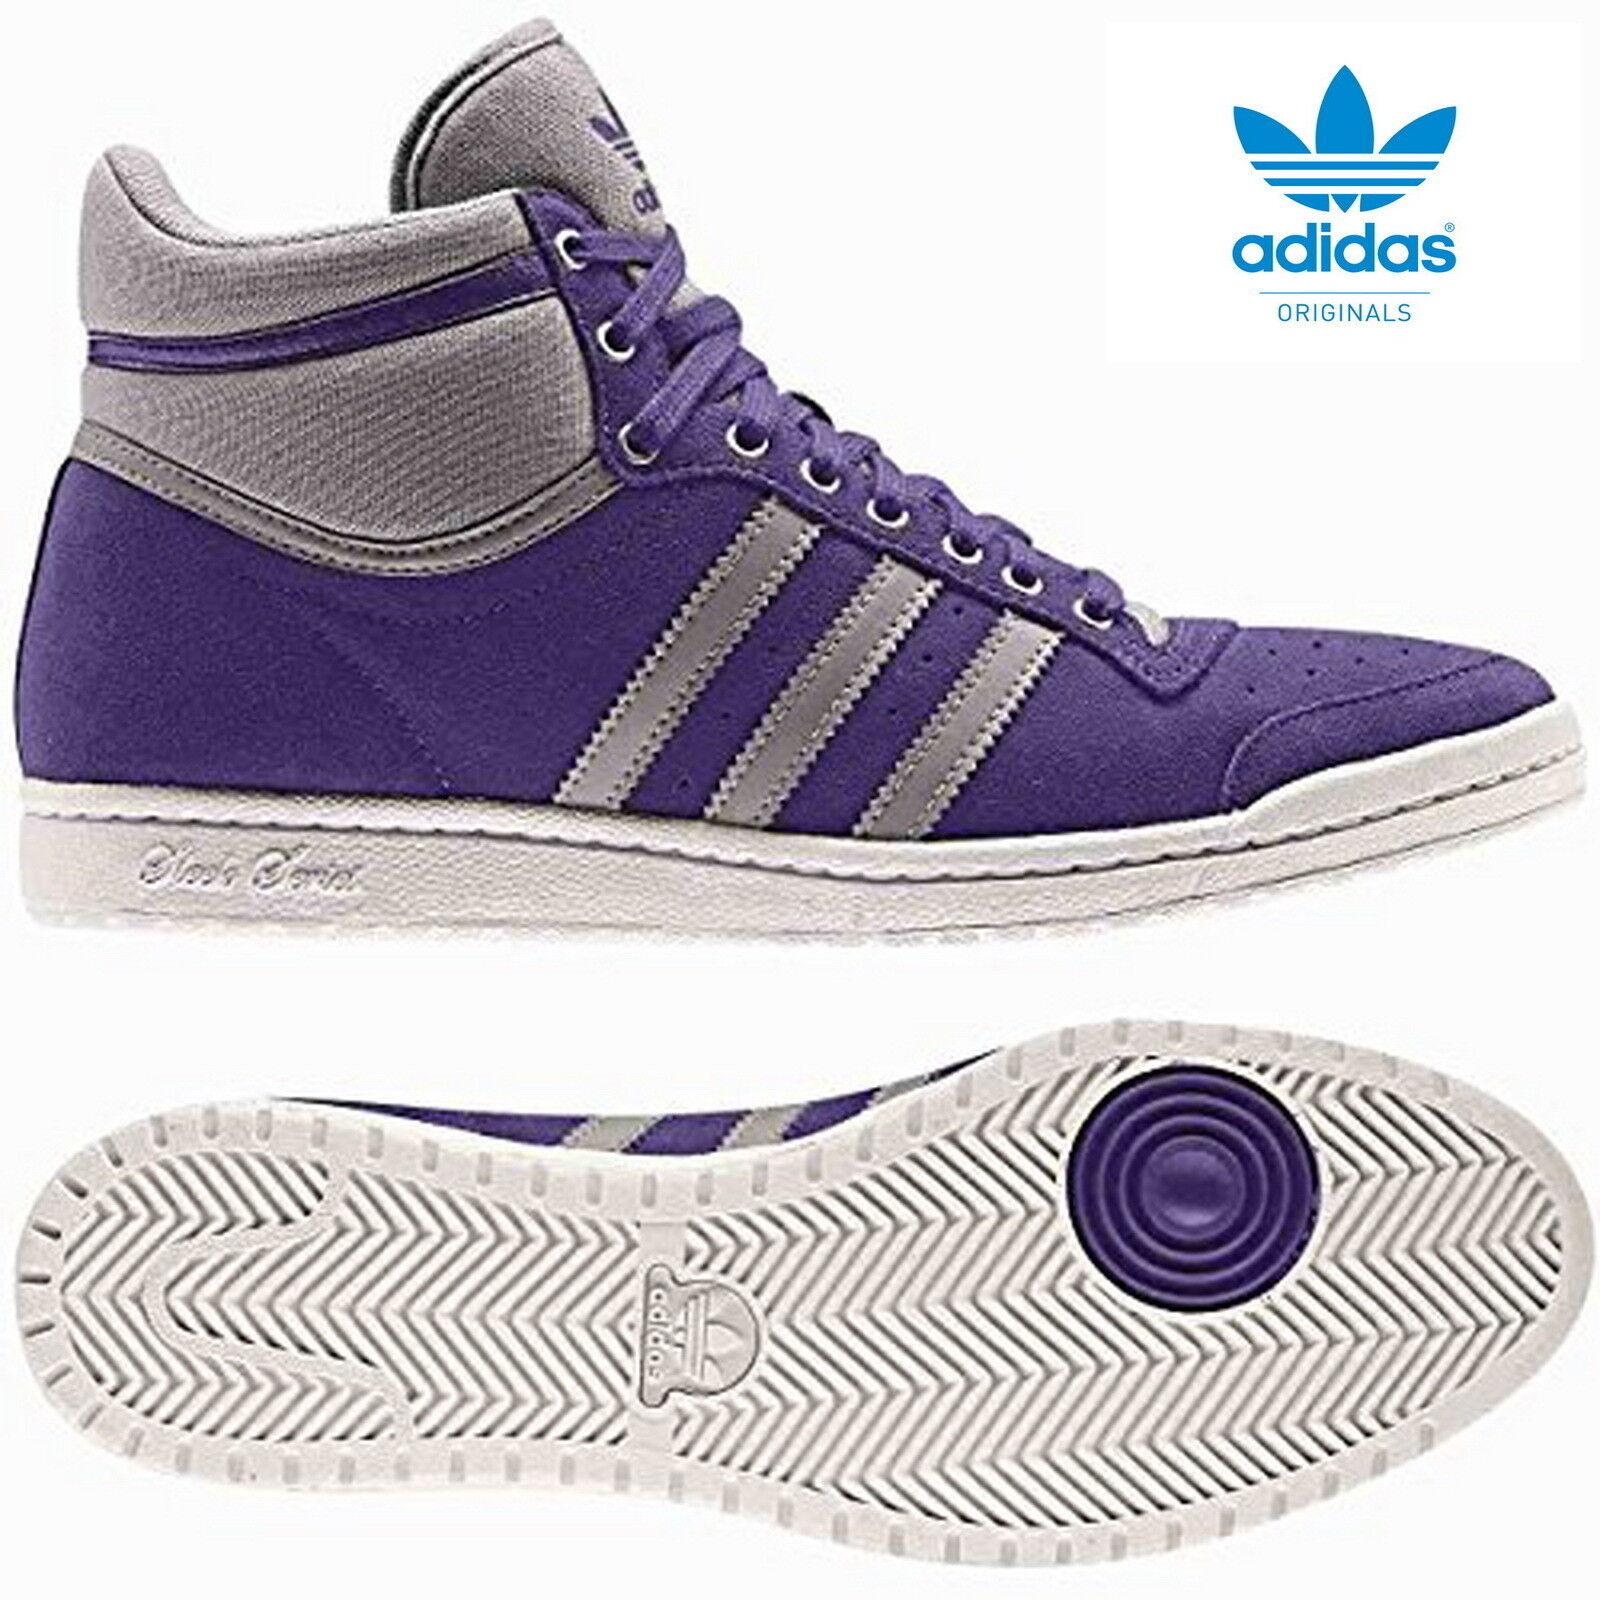 Adidas Top Sleek Ten Hi Sleek Top Original's Damen G95447 c7590a